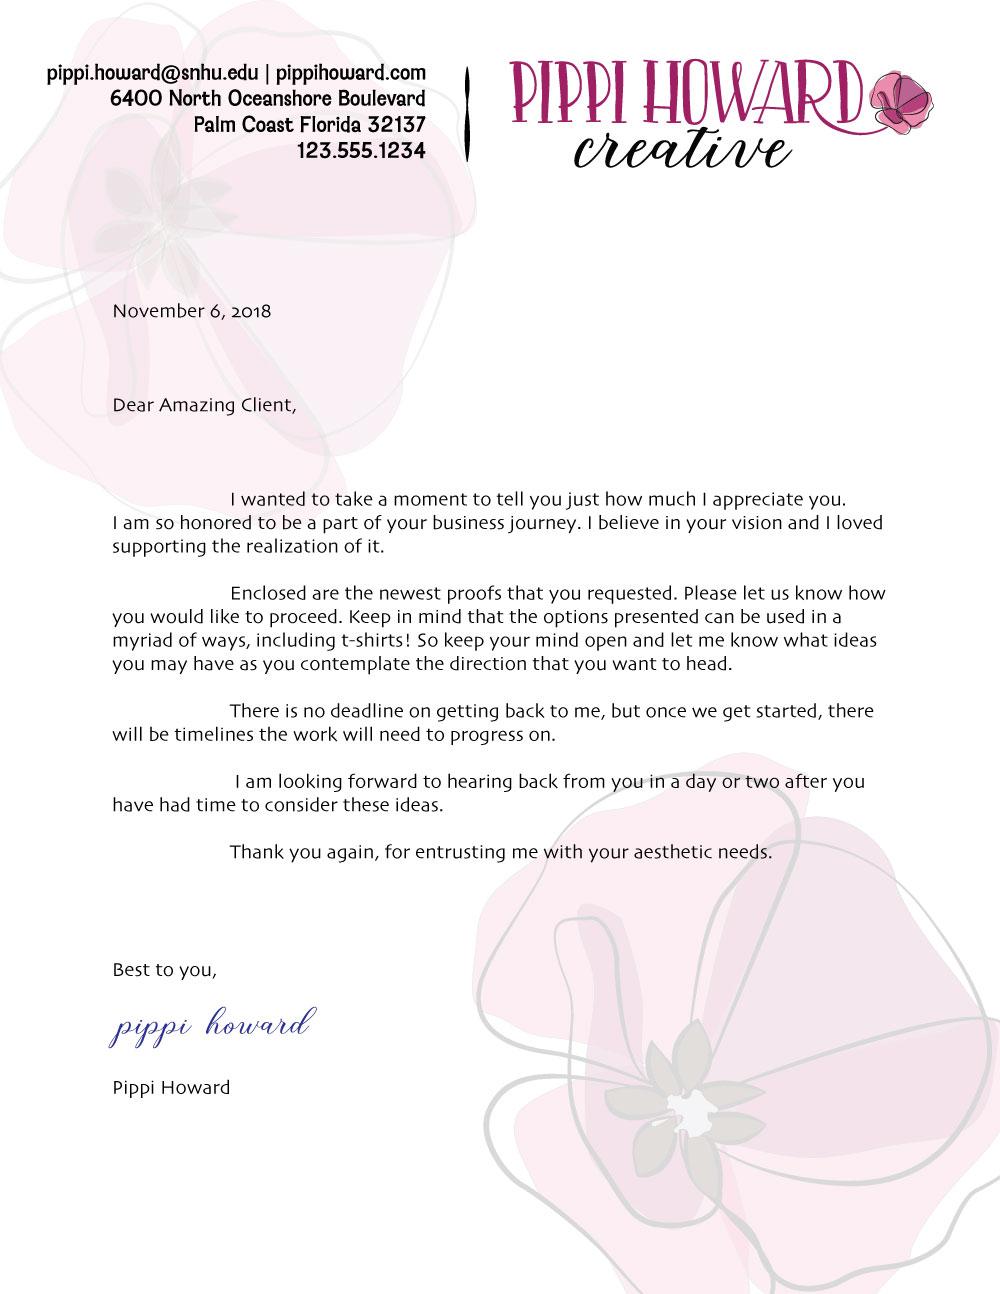 Pippi Howard Creative Letterhead